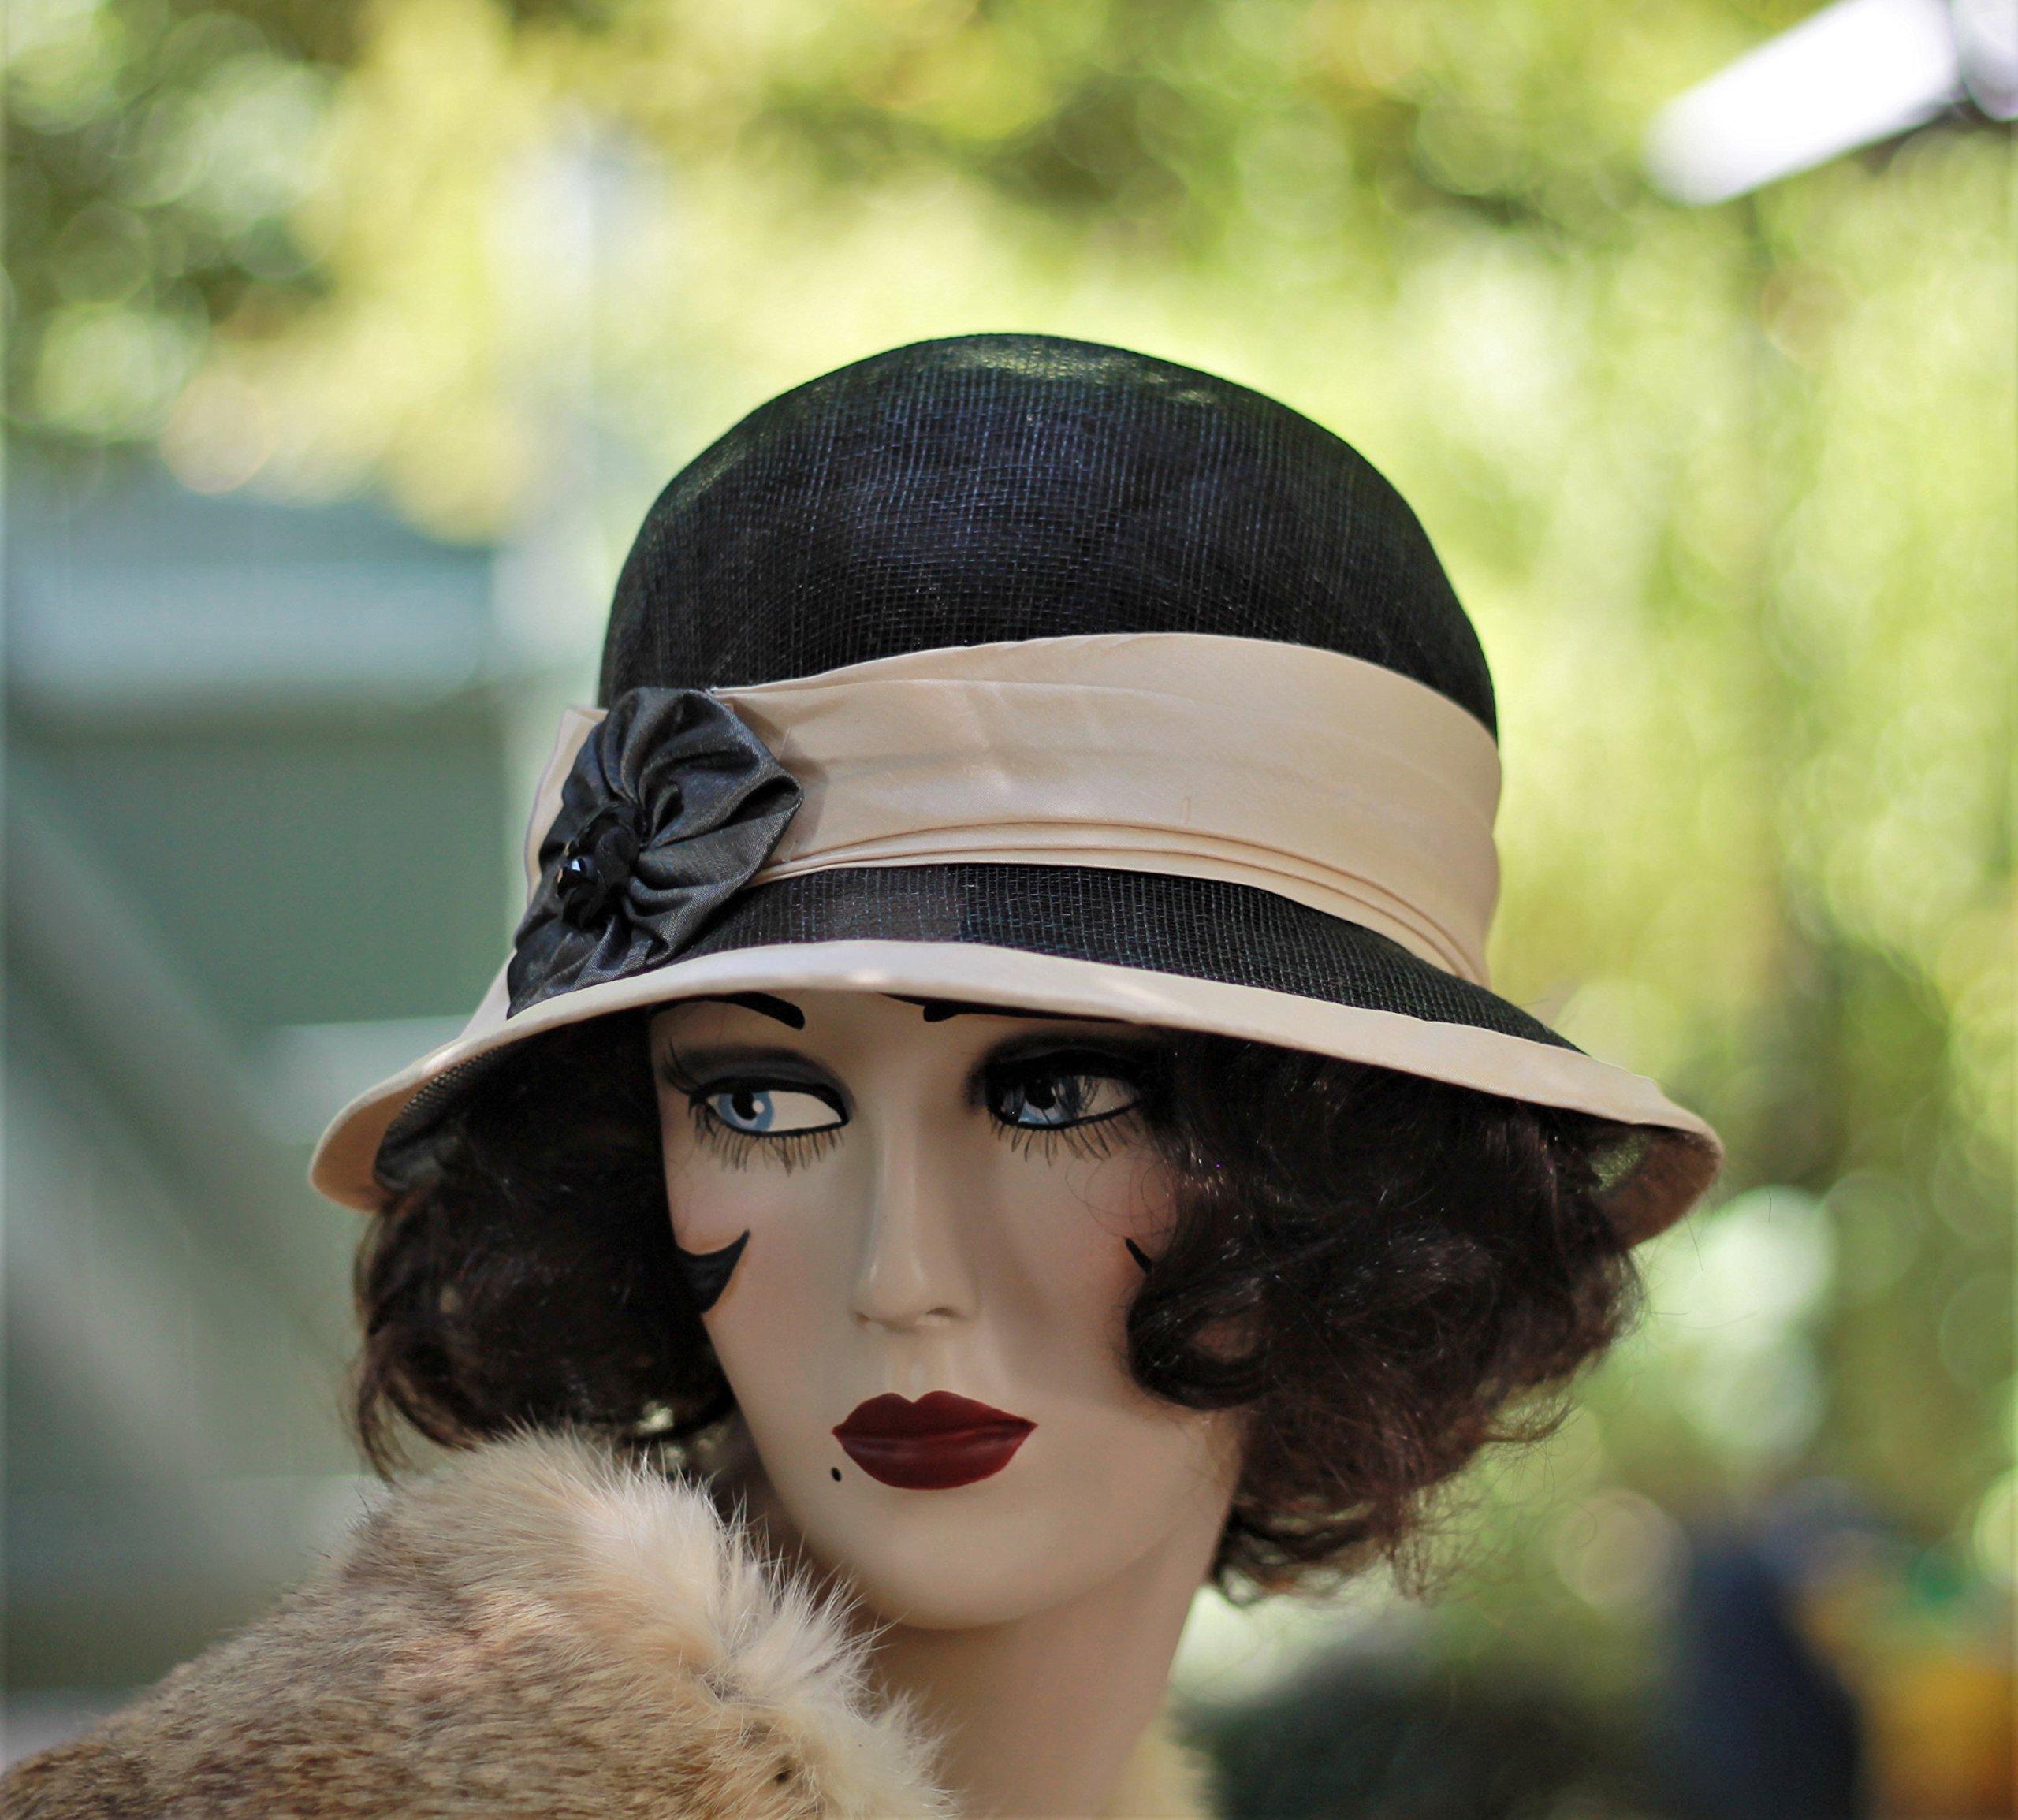 Sinamay 1920s Vintage Style Wide Brim Hat, Downton Abbey